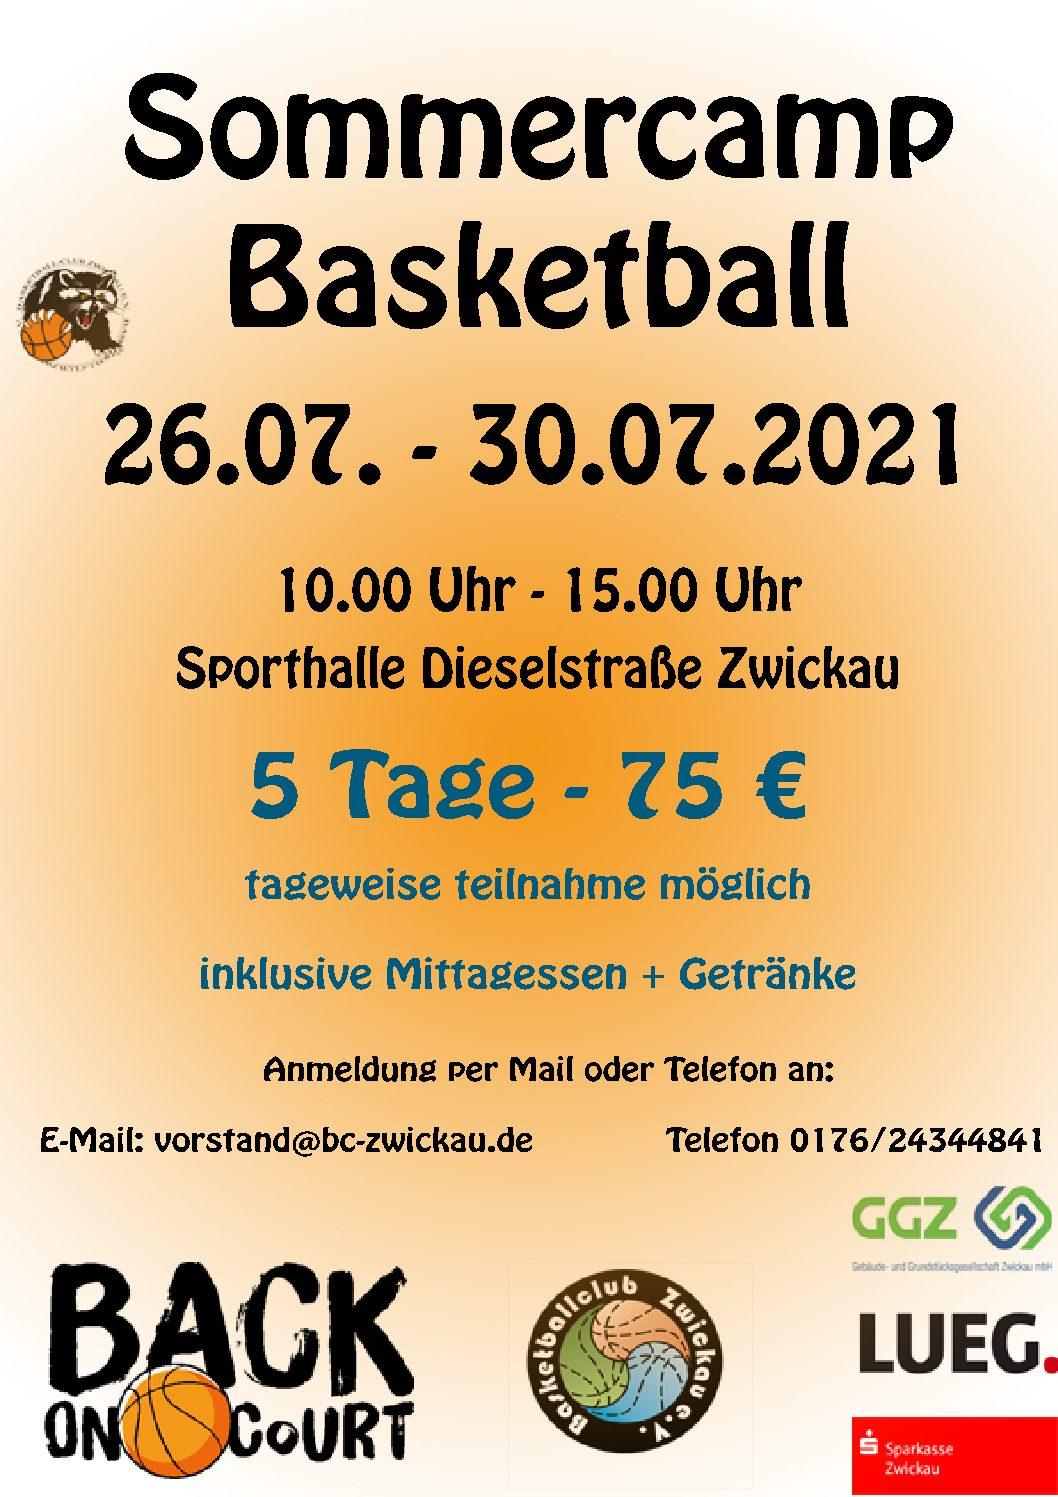 Sommercamp Basketball